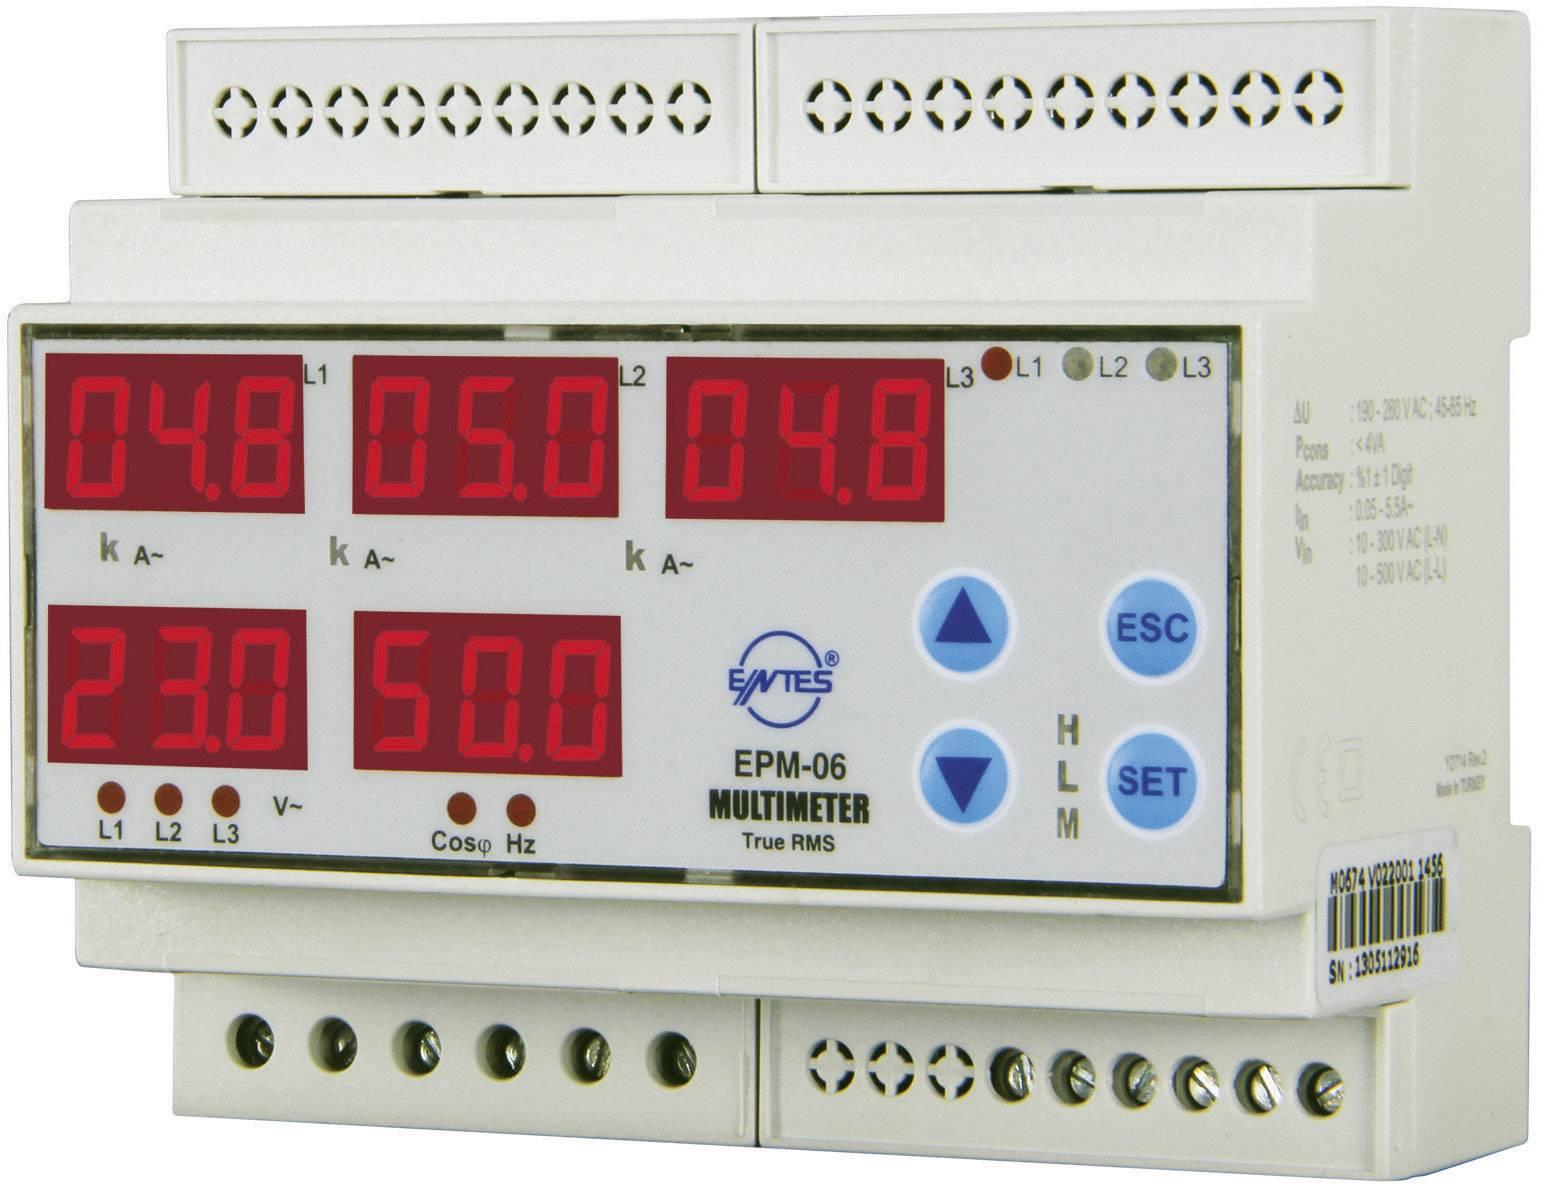 ENTES EPM-06CS-DIN  Programirajući trofazni izmjenični multimetar Napon, struja, frekvencija, sati rada, ukupni sati